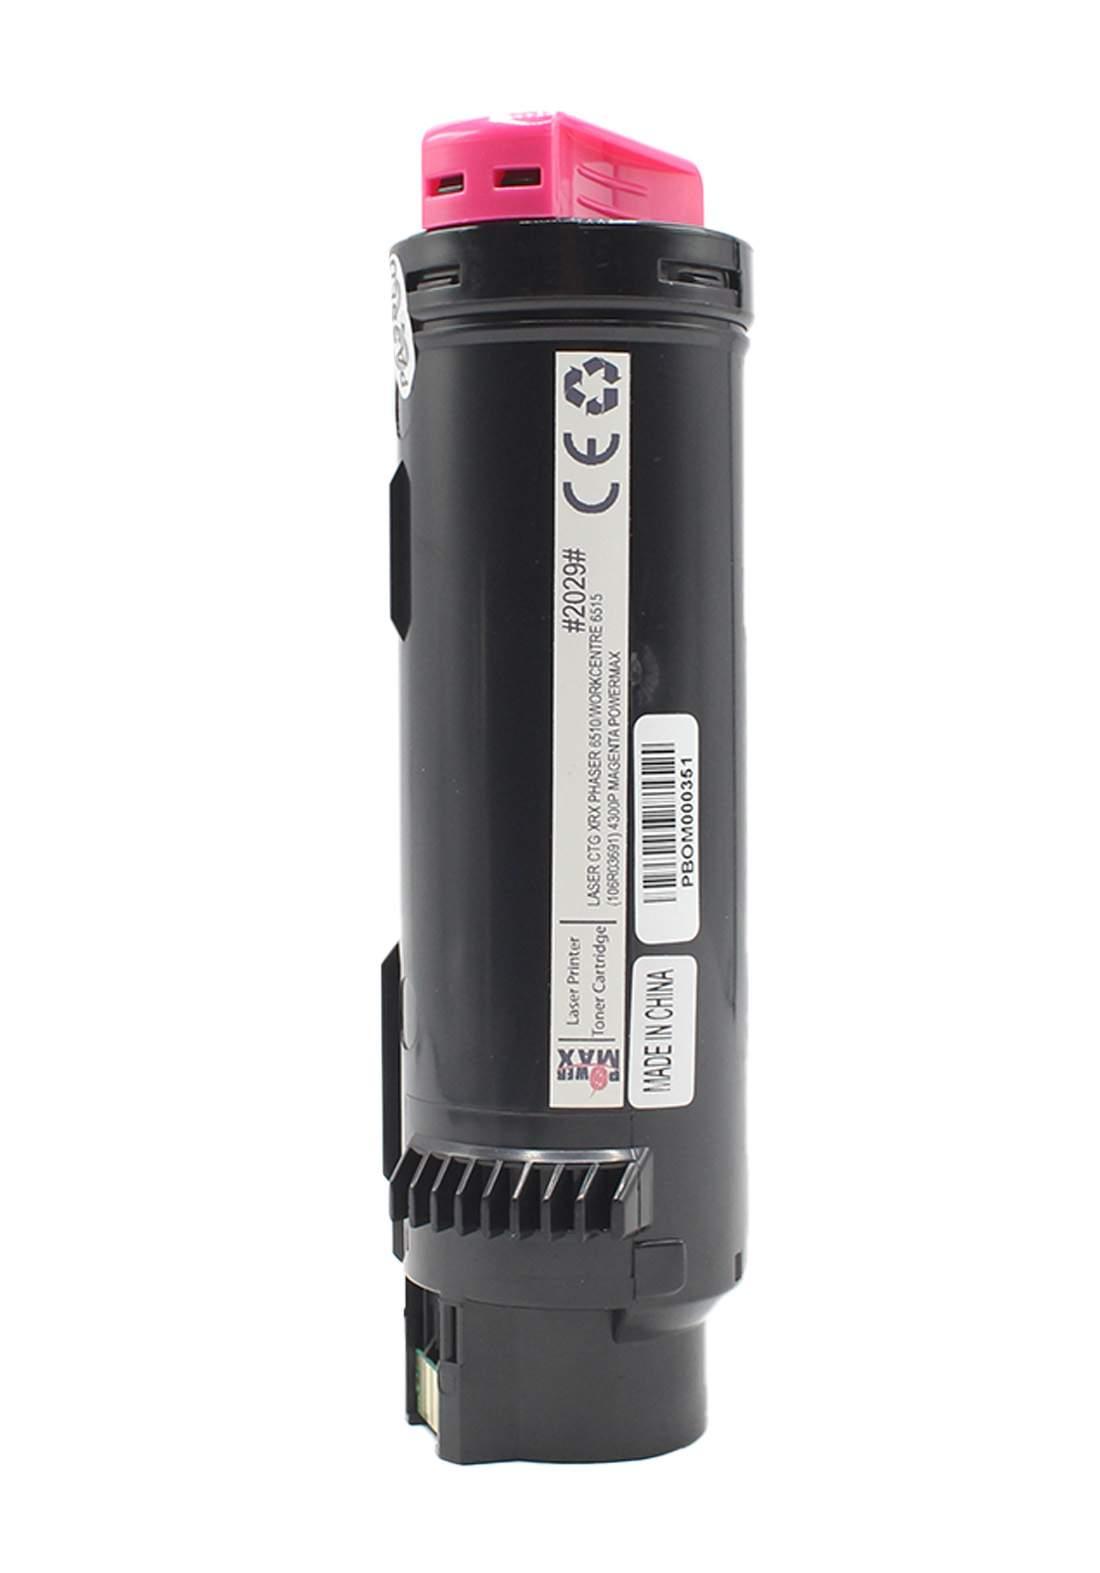 Power Max CTG Xerox Phaser 6510/ Workcentre 6515 (106R03691) 4300P Laser Printer Toner Cartridge خرطوشة حبر